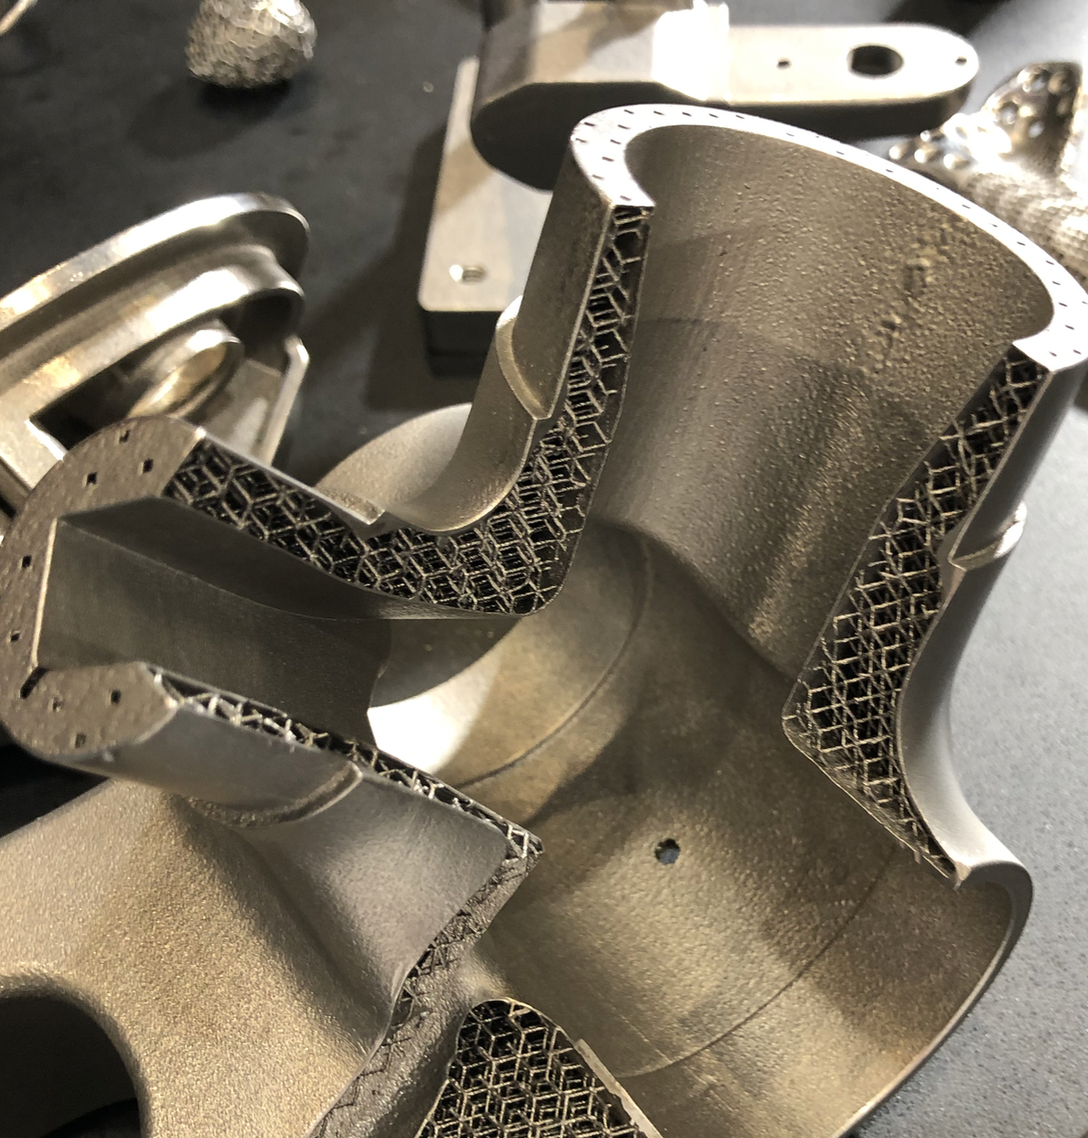 NZ's RAM (Rapid Additive Manufacturing) 3d printed titanium.